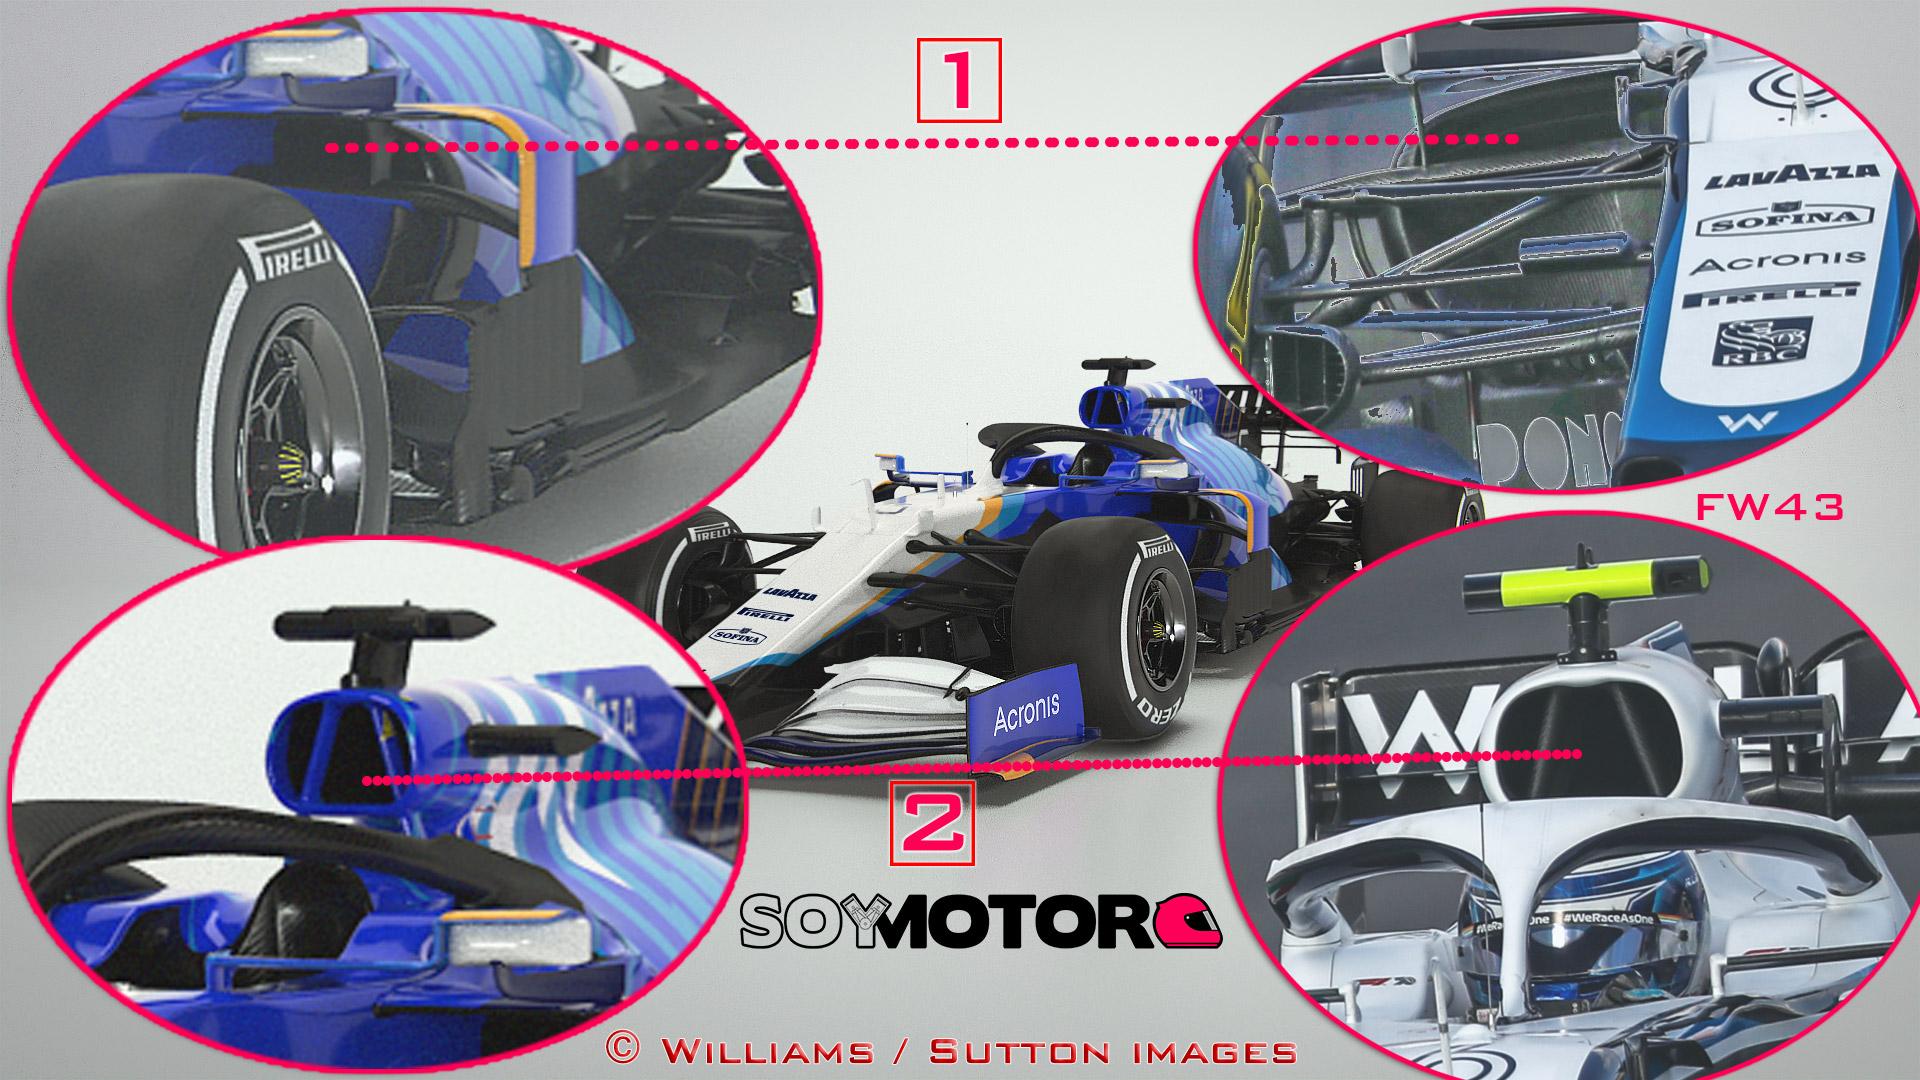 williams-fw43b-frontal-3-soymotor.jpg